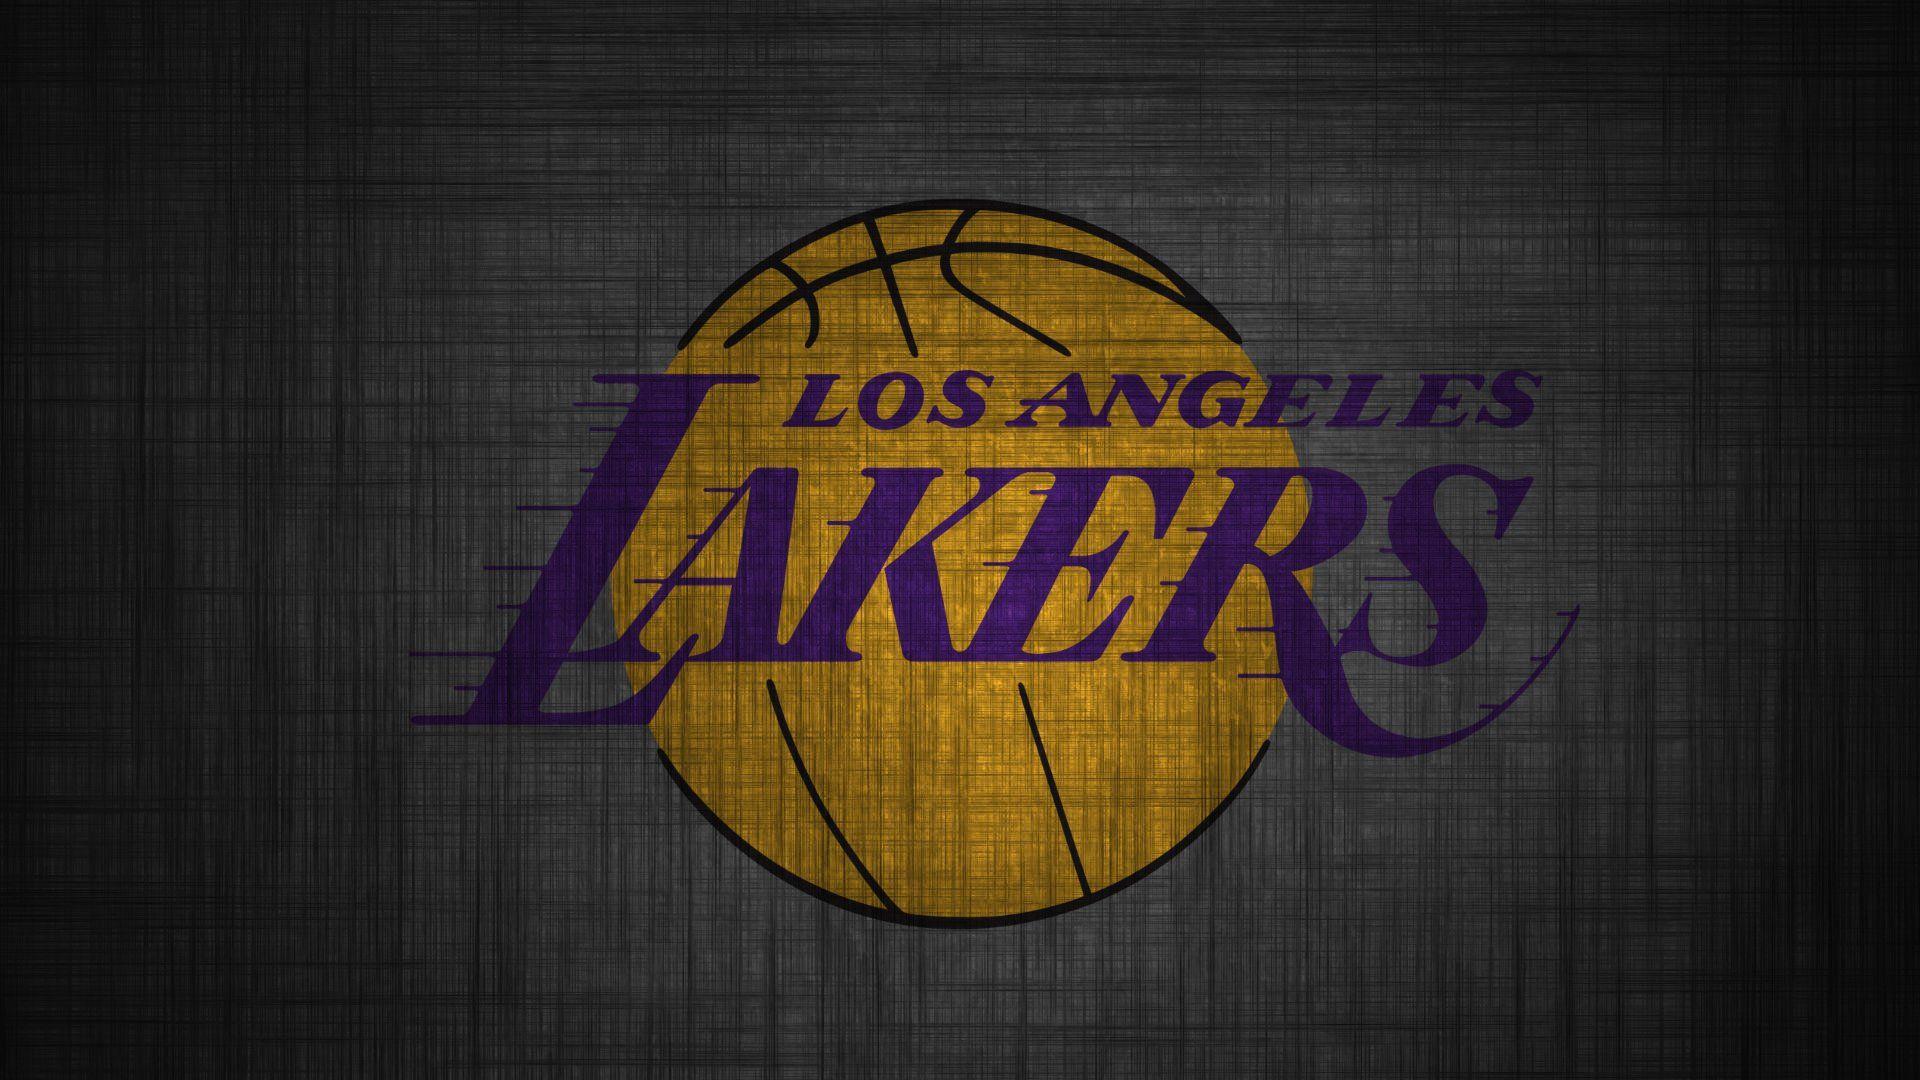 Lakers Wallpaper High Definition Lakers Wallpaper Nba